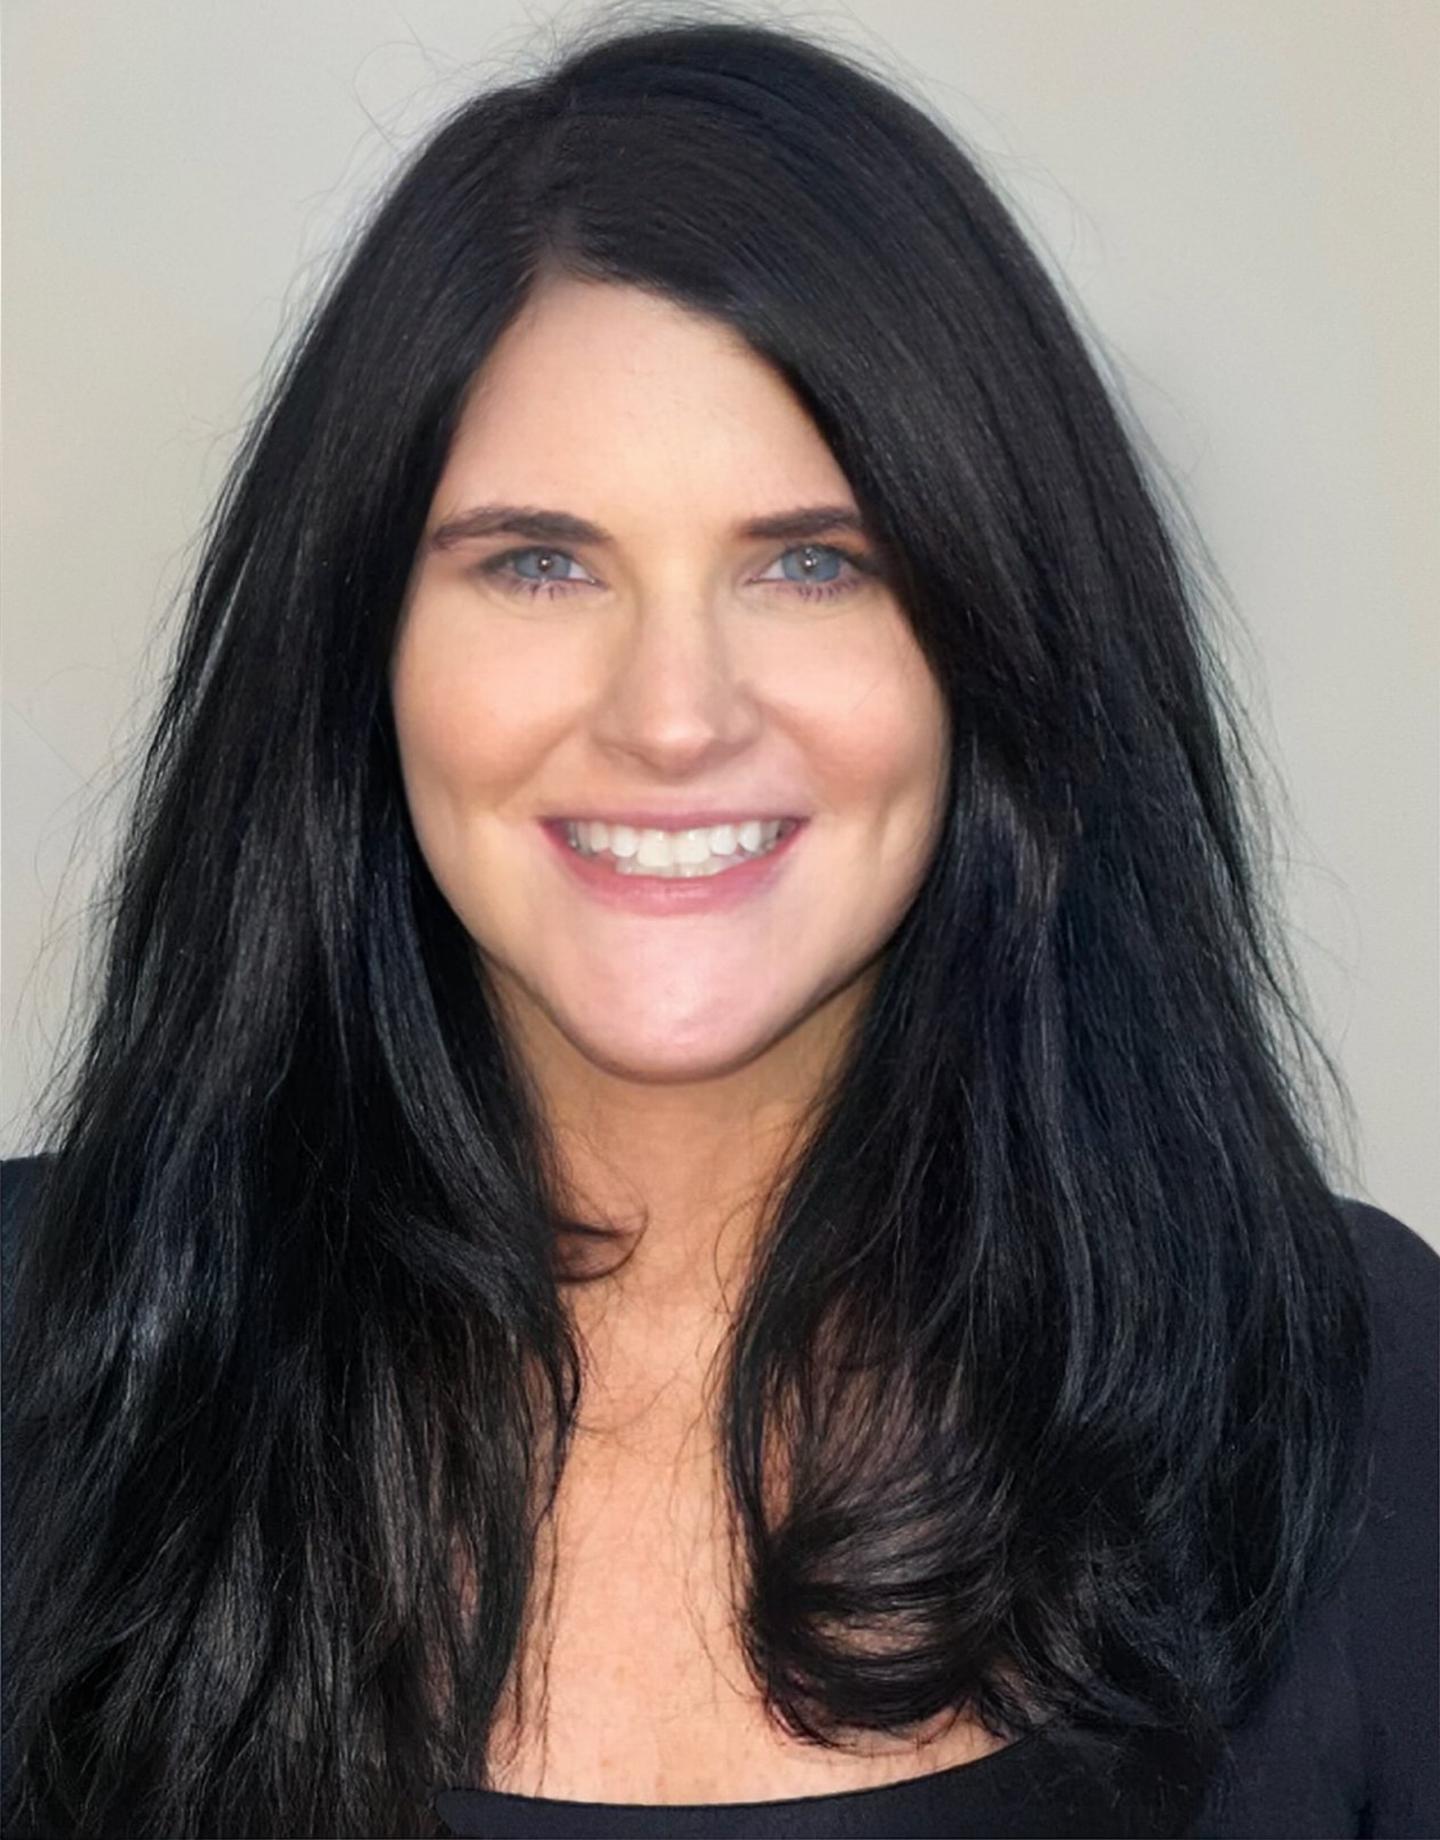 Kimberly Carney, Founder & CEO, Fashwire Inc.